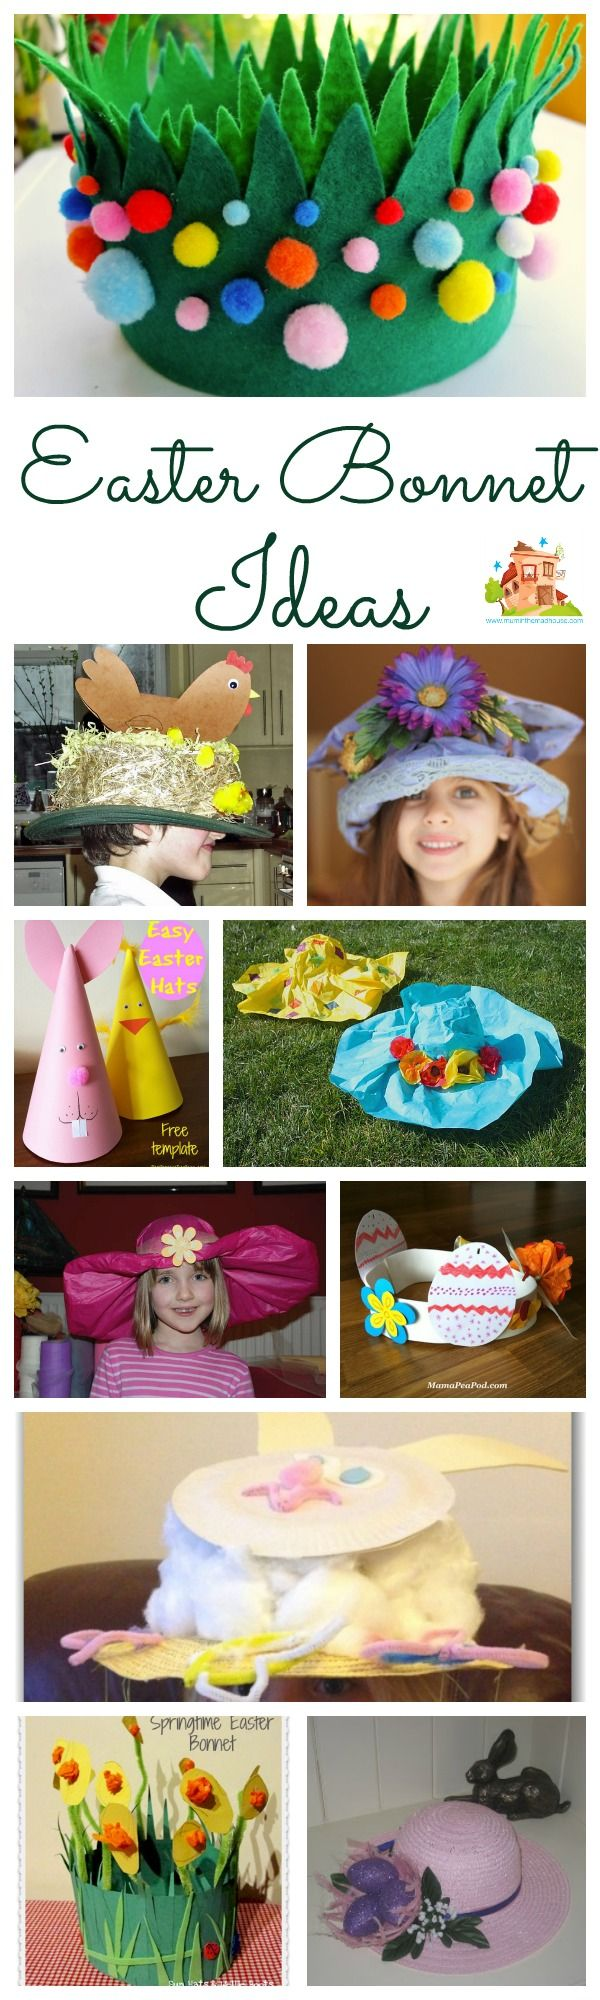 336319b5416 Easter Bonnet Ideas